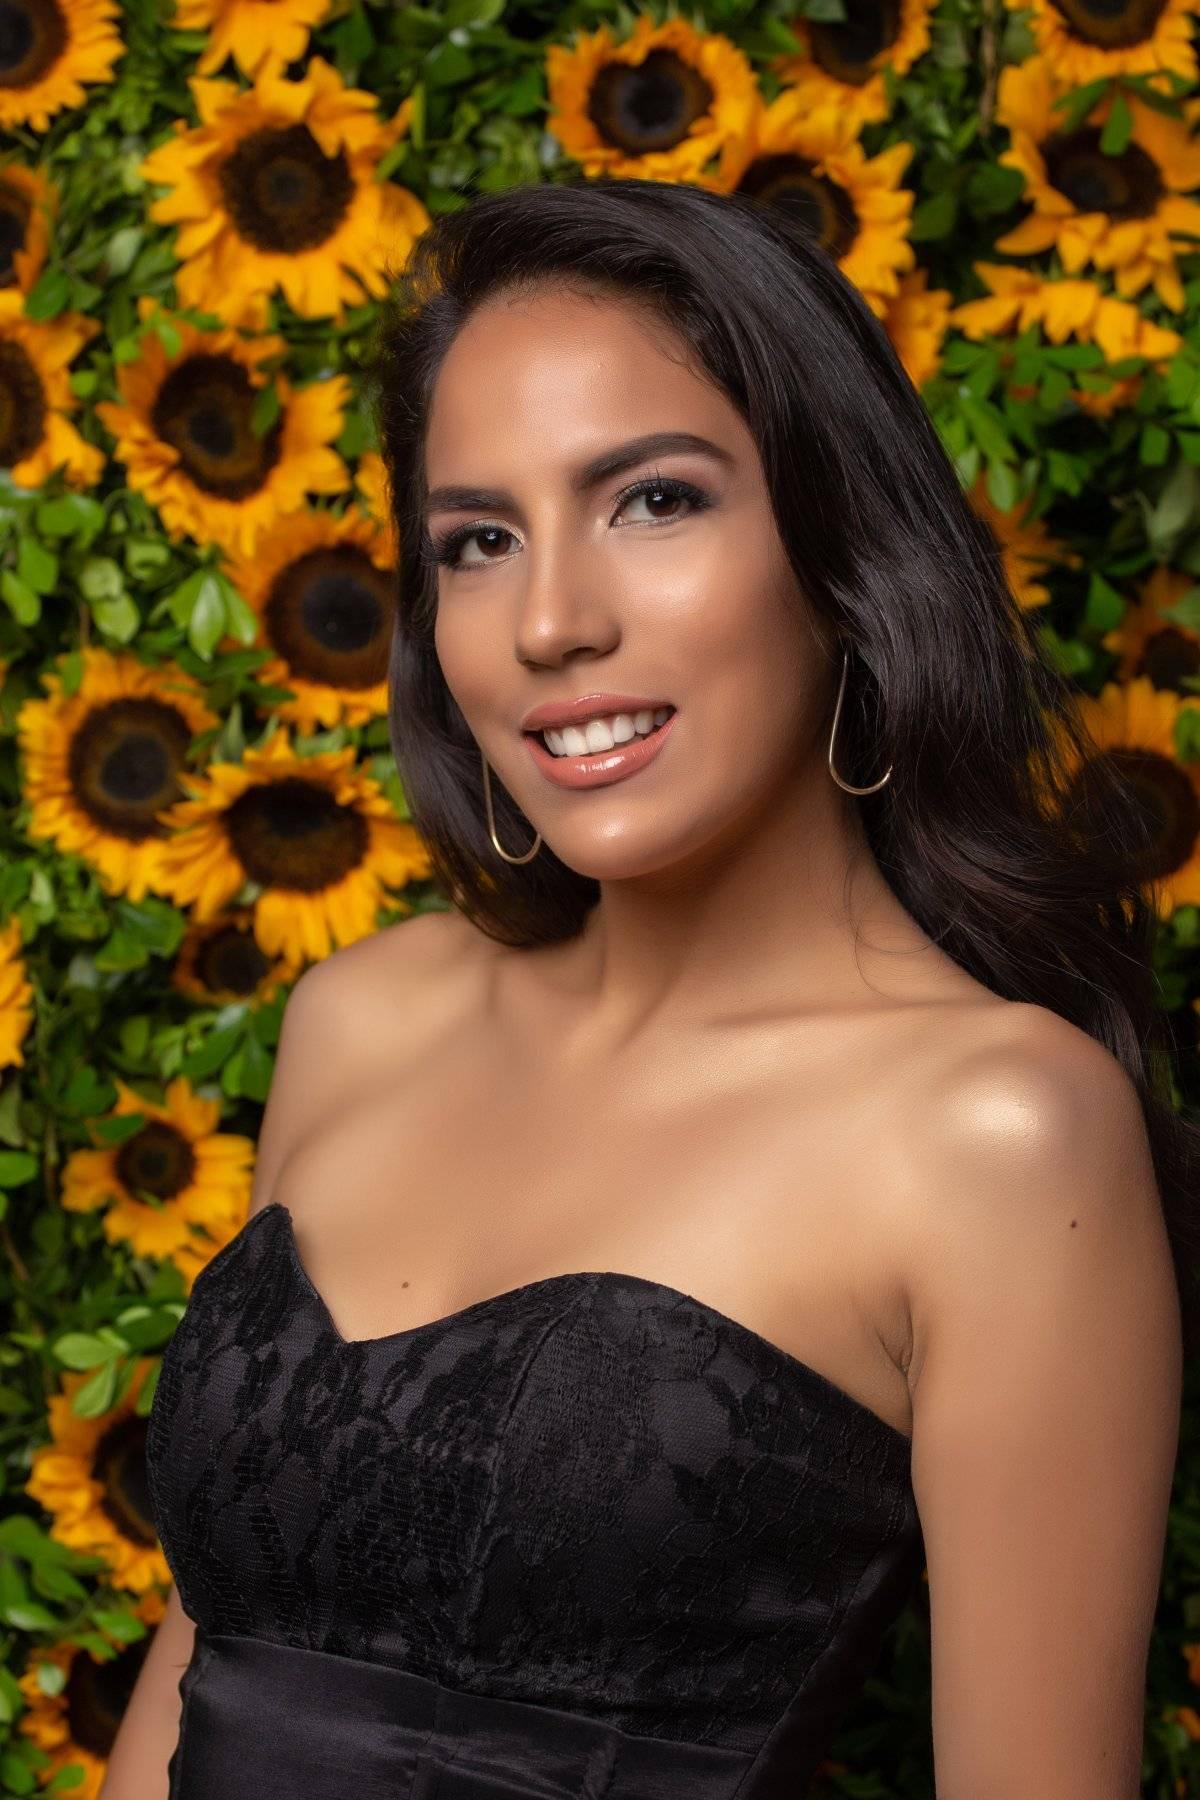 CANDIDATAS A MISS ECUADOR 2019.  FINAL 19 DE JULIO 12alejandracarvajalguayaquil-3552698a46ea1e472f99e232f6795c24-1200x0